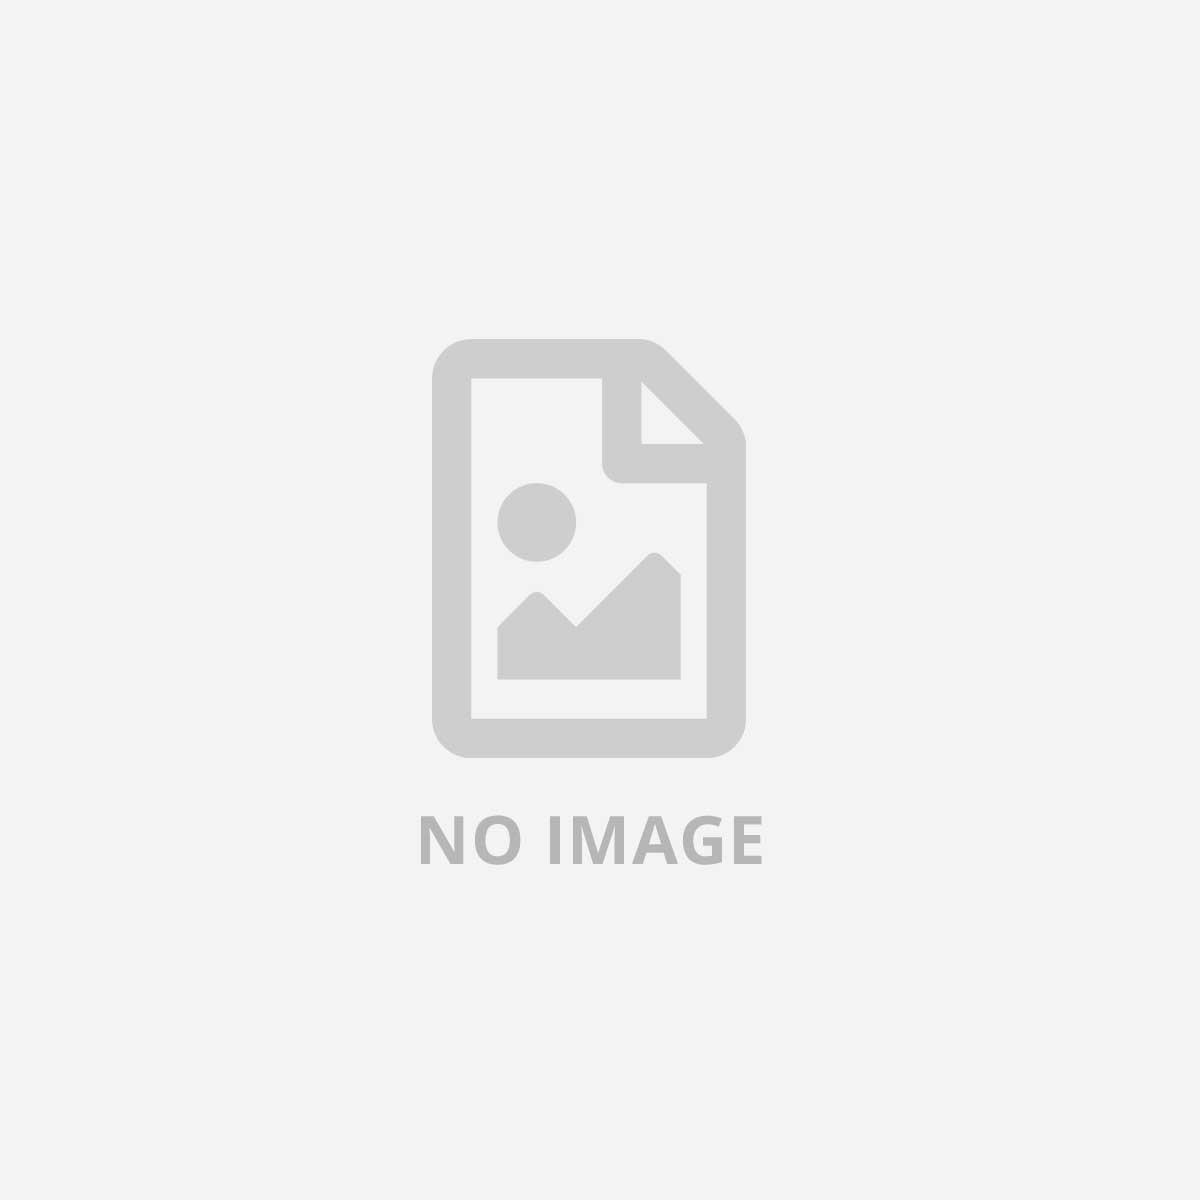 CANON CF4 ENGINEERING STANDARD PPC 80G